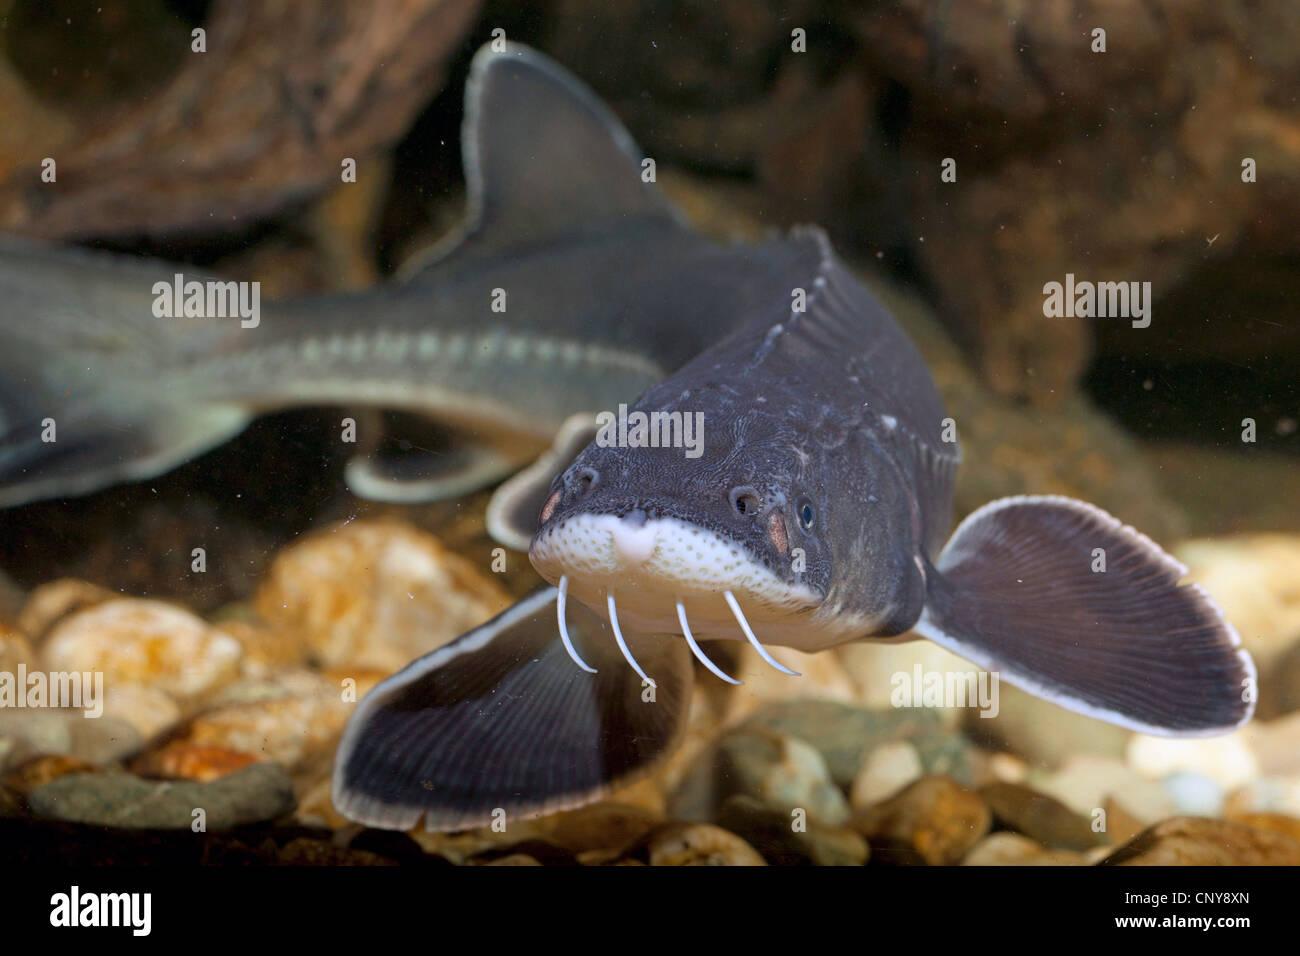 Adriatic sturgeon (Acipenser naccarii), front view - Stock Image